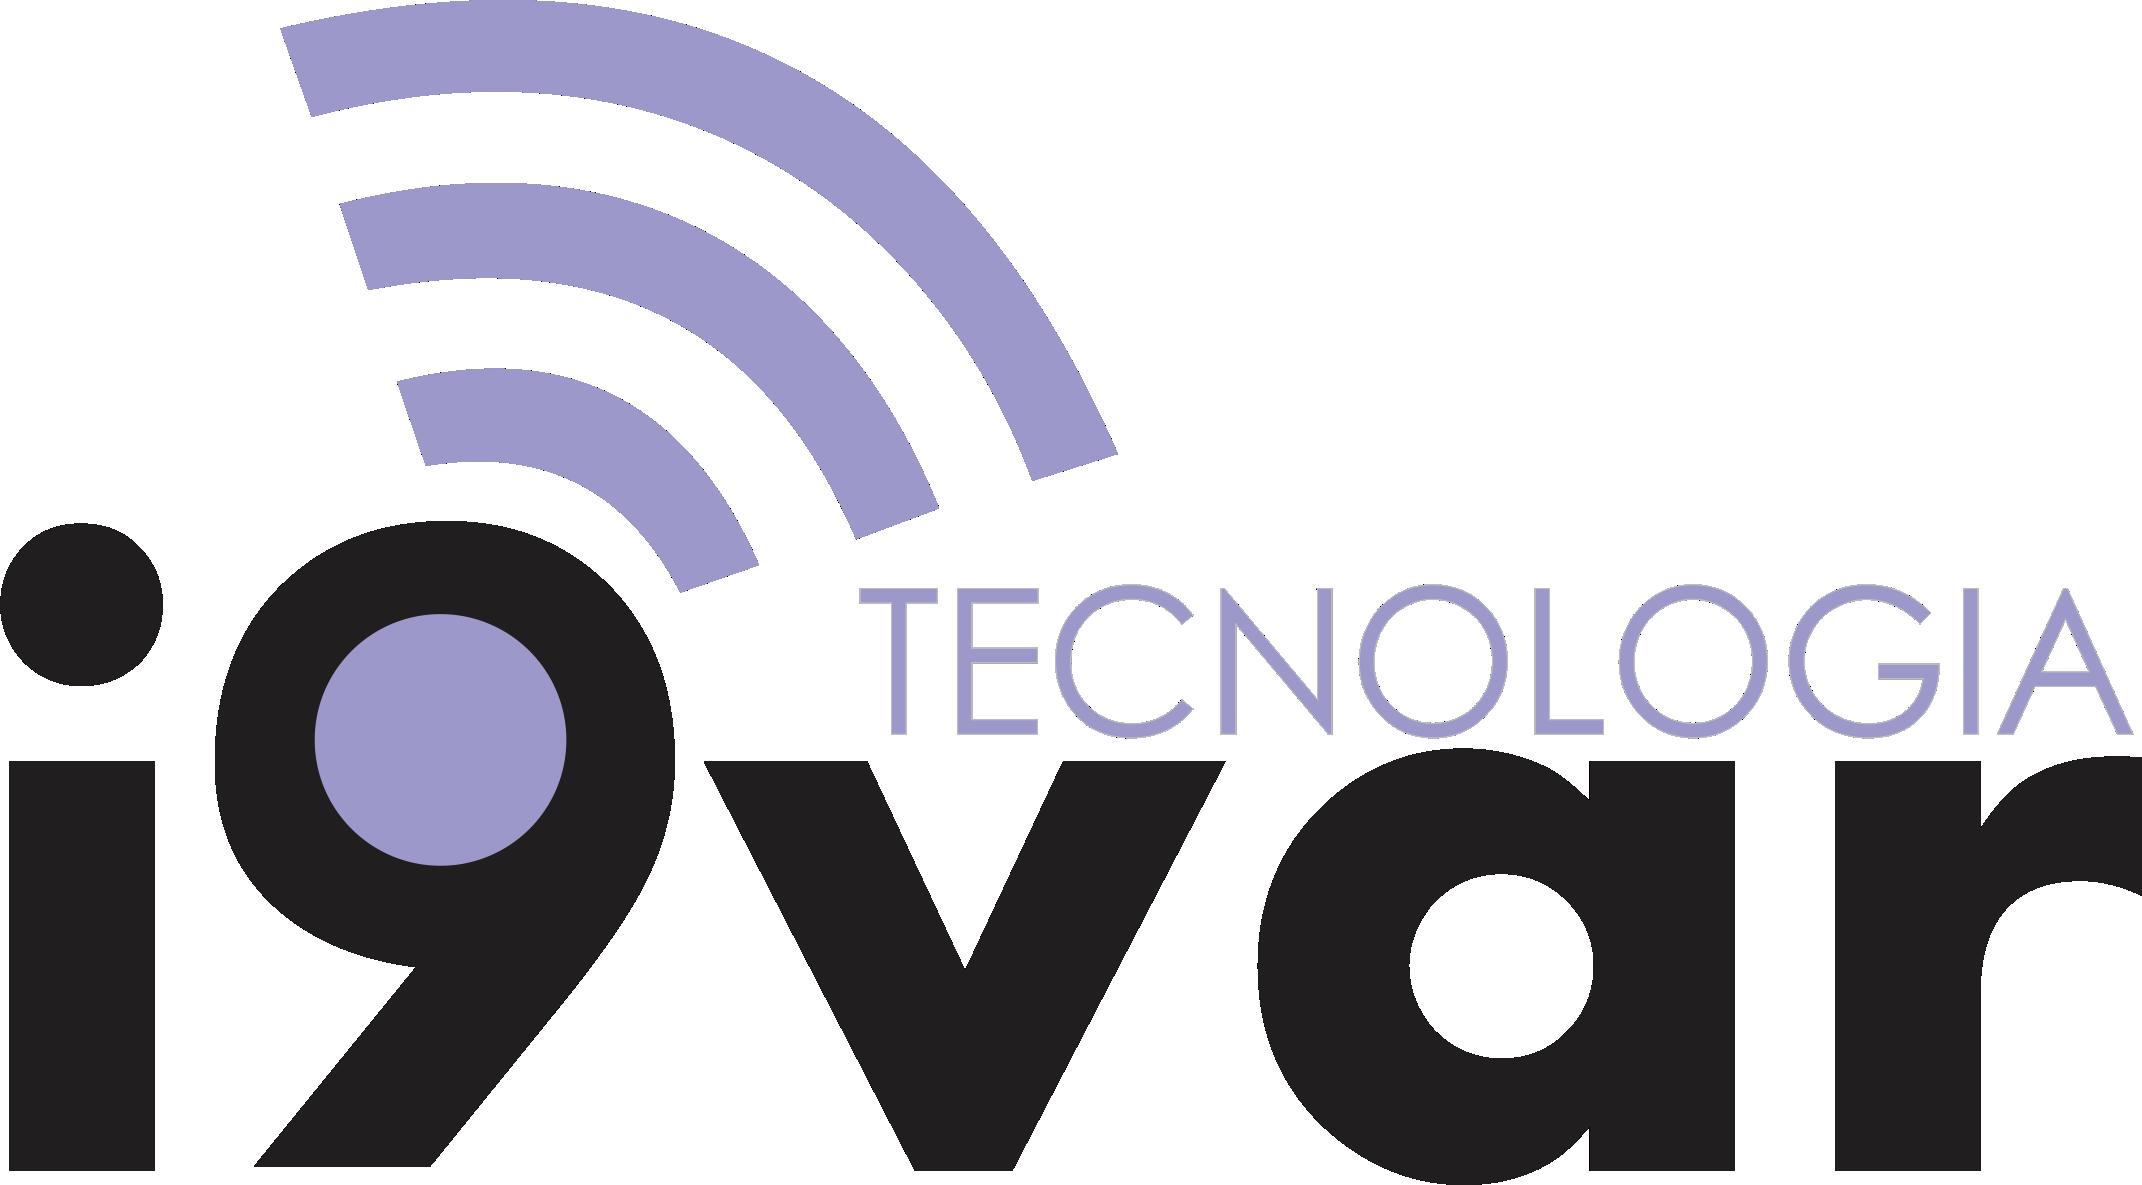 i9varTecnologia